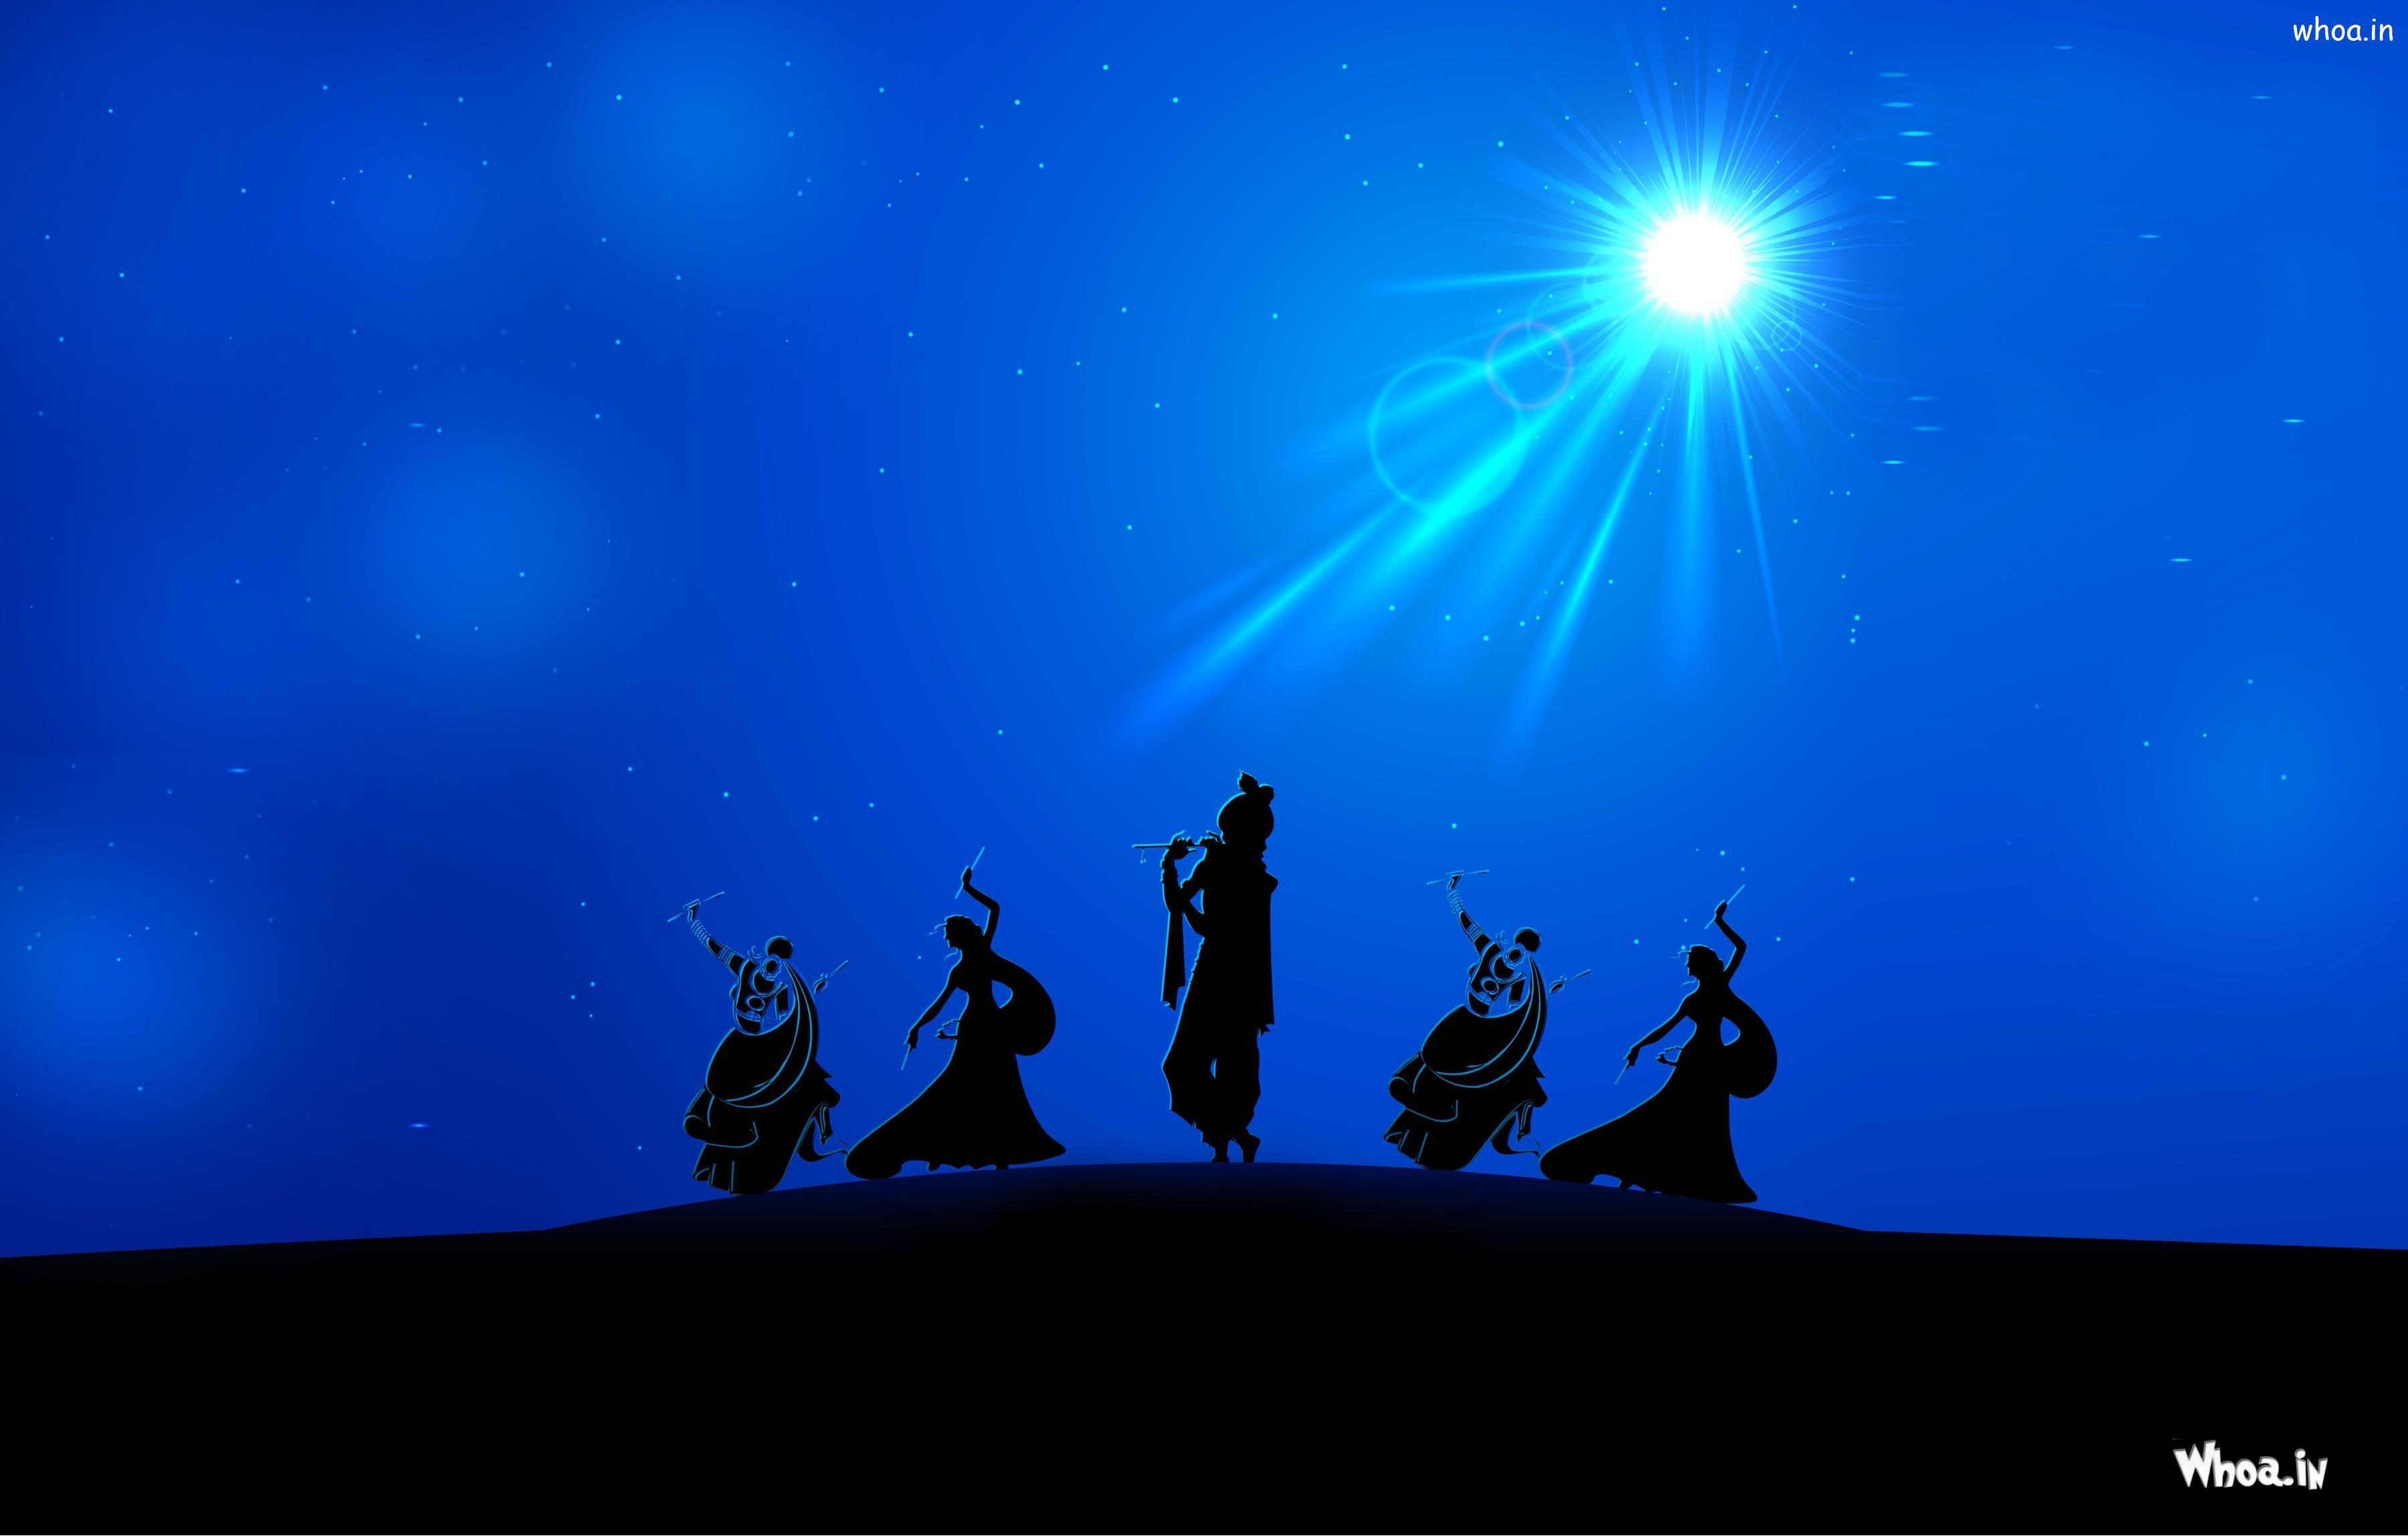 lord krishna rass leela in night with blue background hd wallpaper